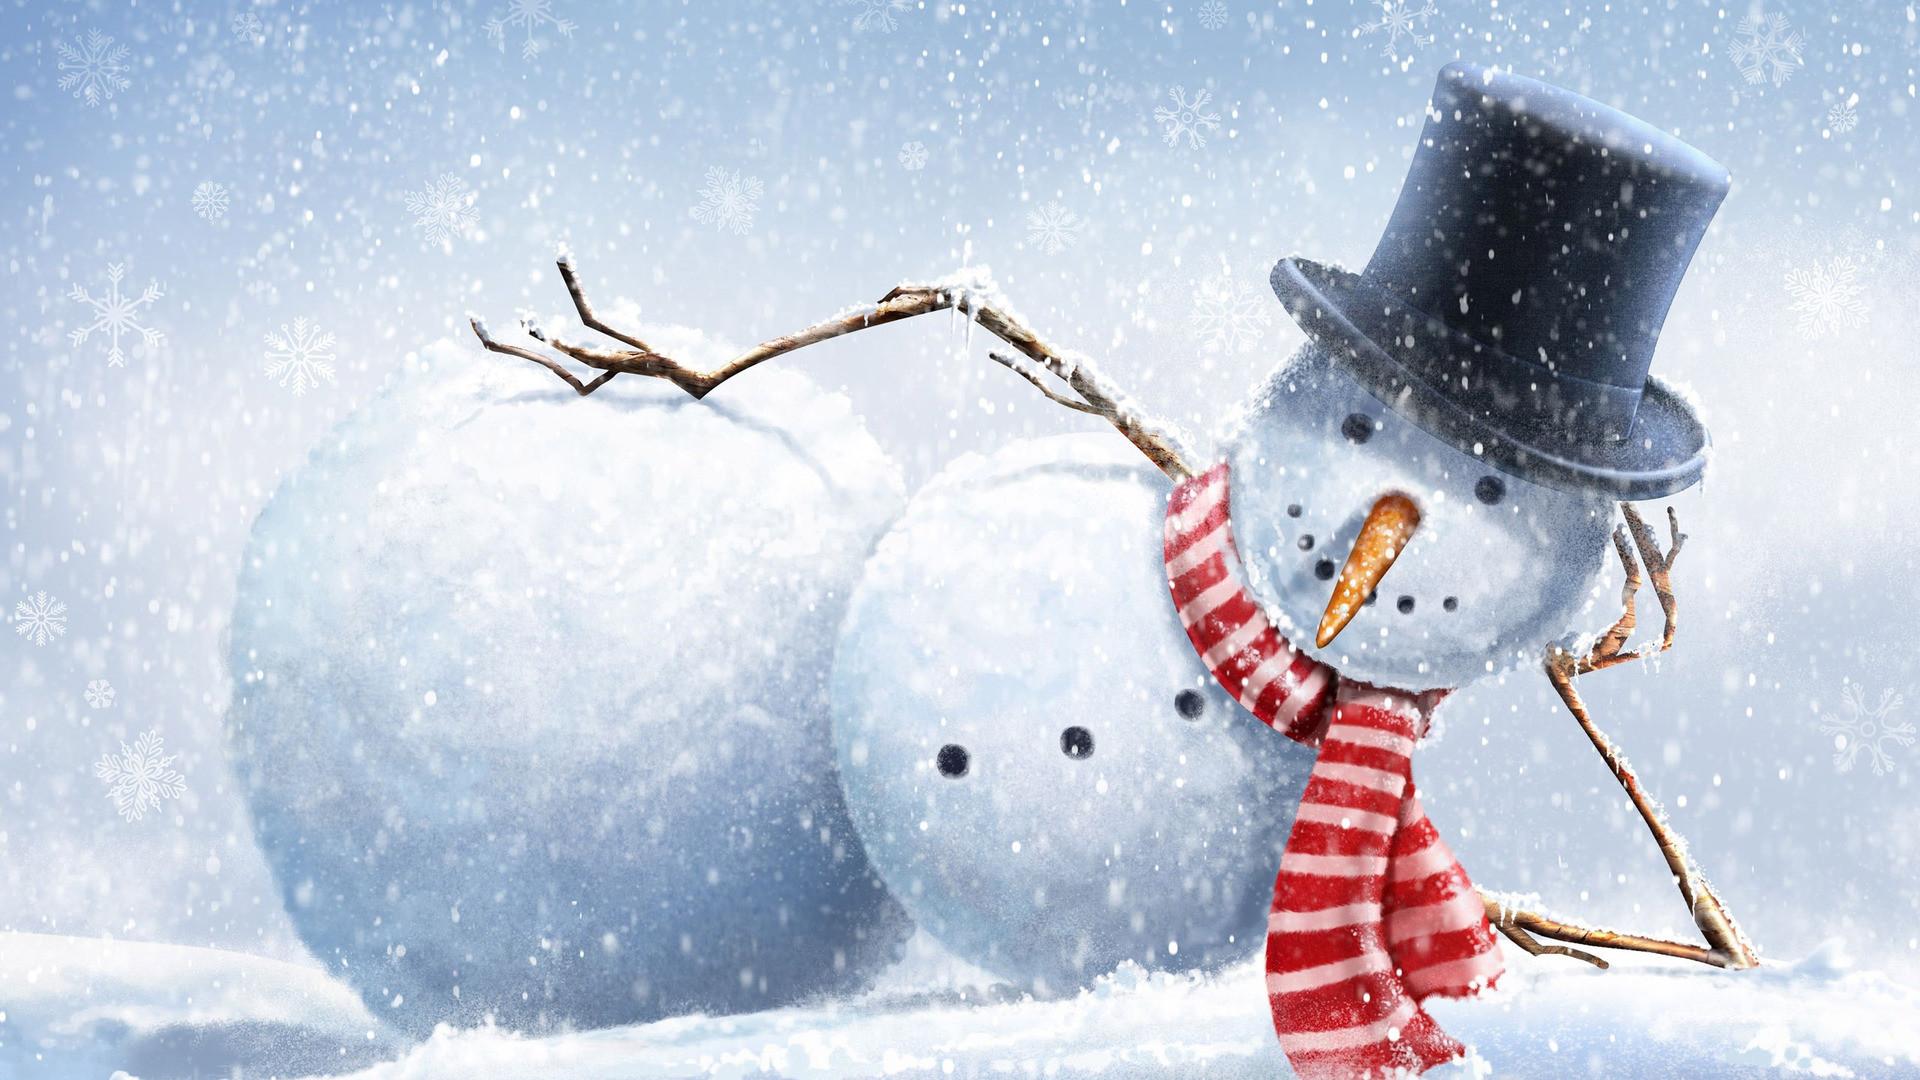 1920x1080 Snowman Wallpaper 24717